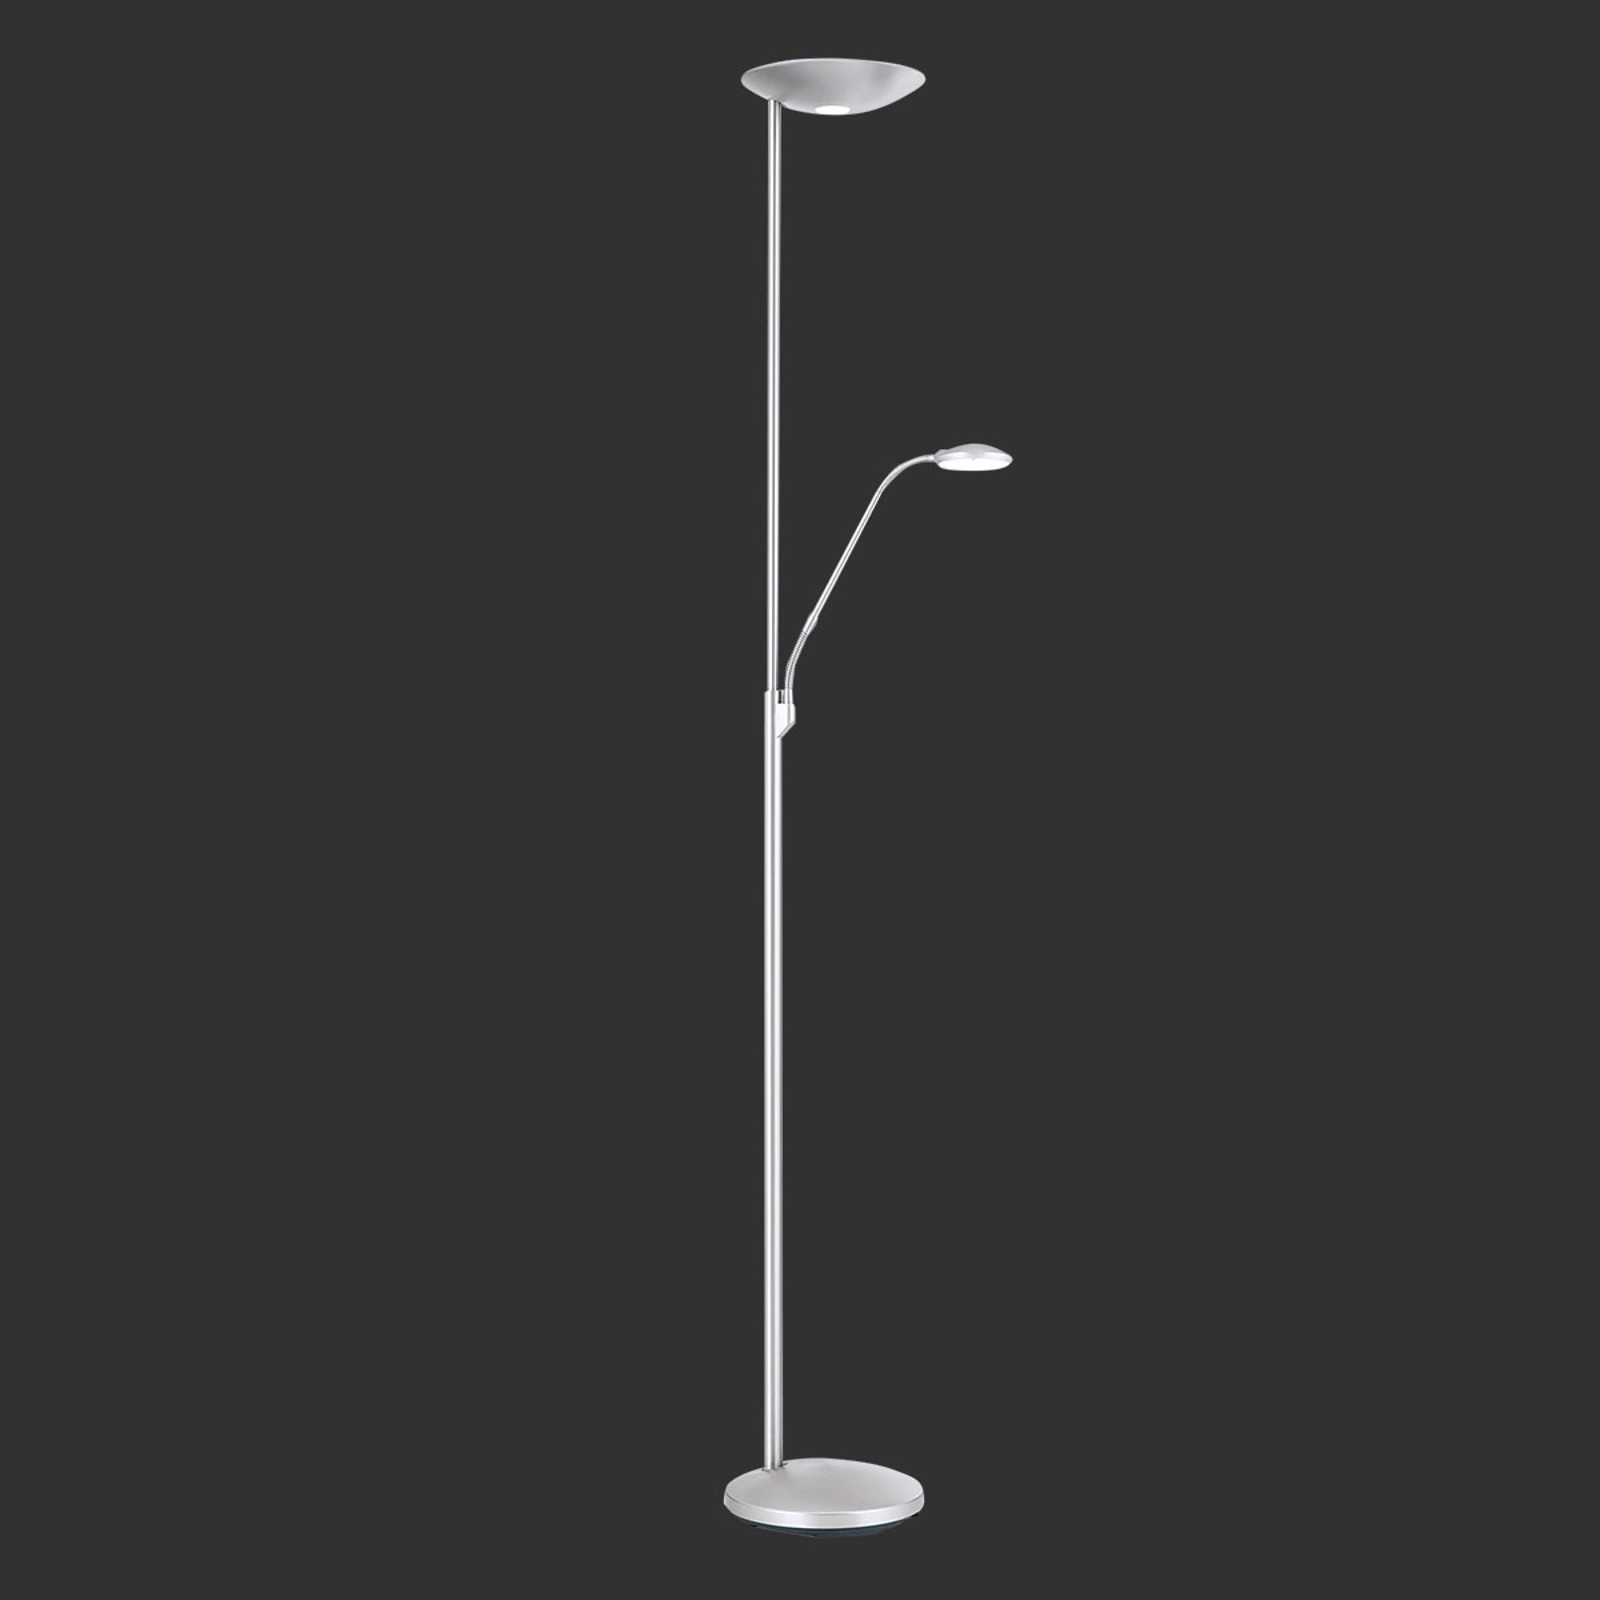 LED uplighter Cobra in nikkel mat met leeslamp